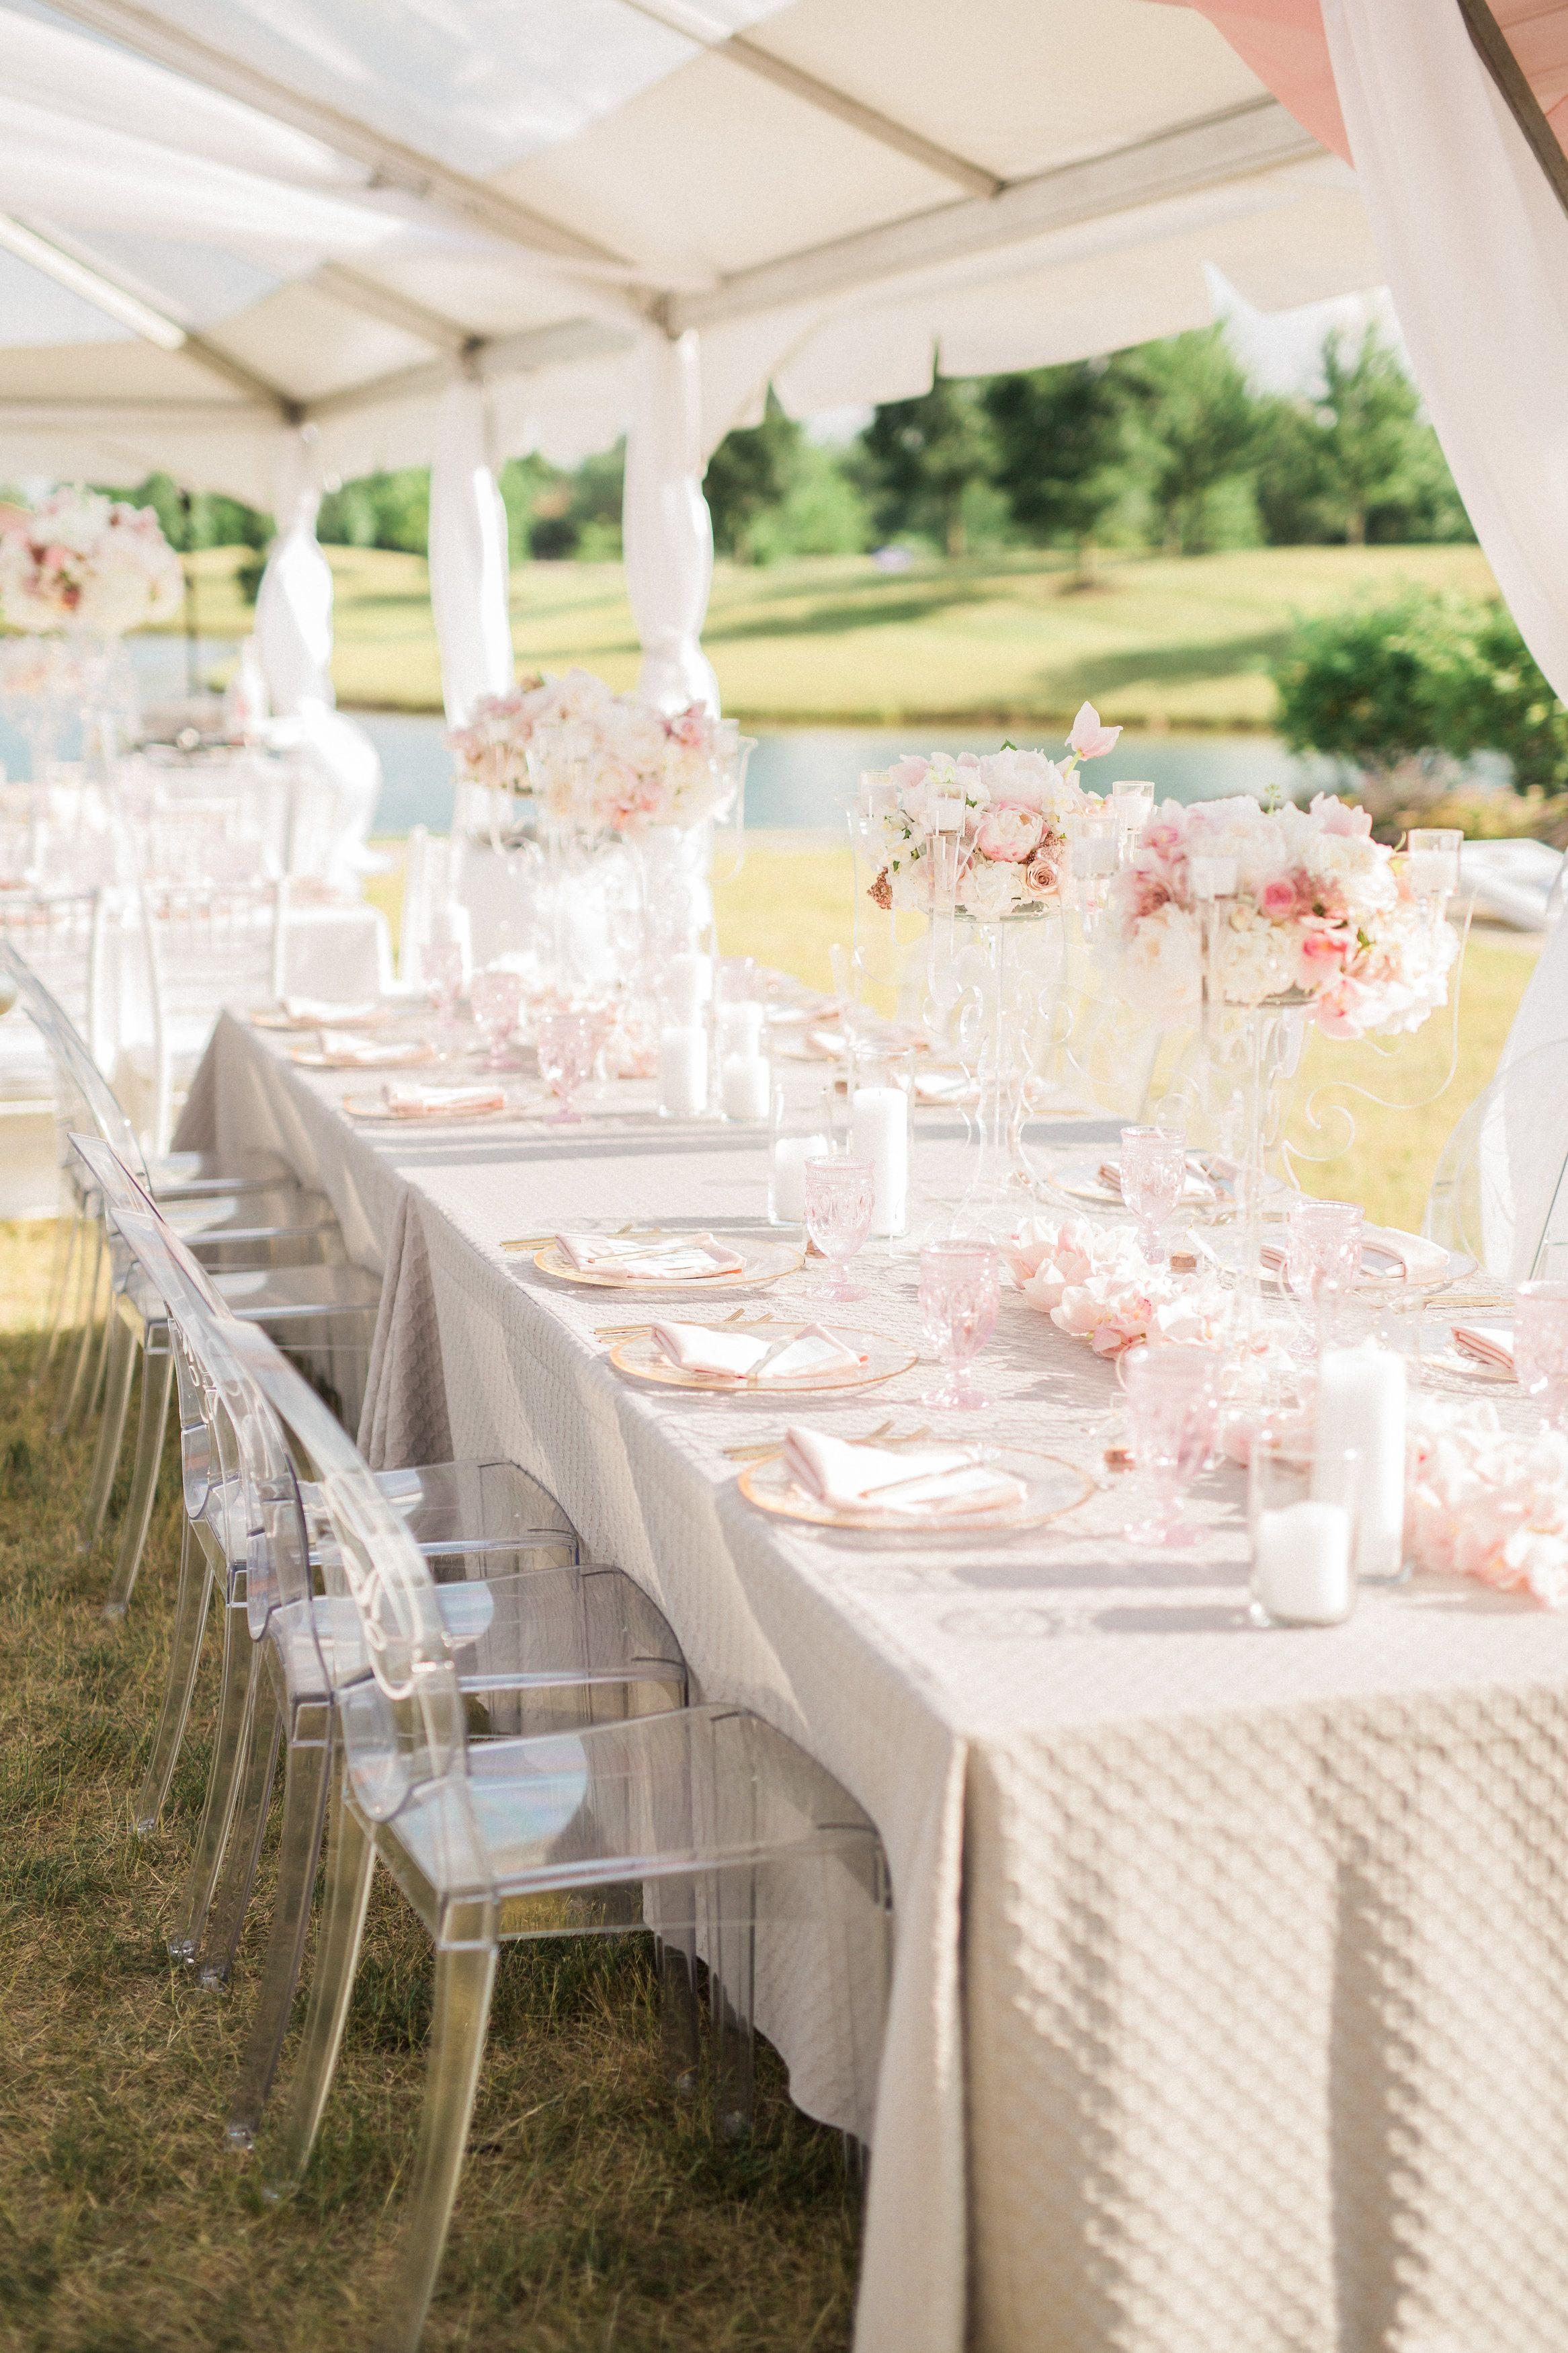 Posy Mmj Events Style Story Creative Columbus Ohio Outdoor Wedding Reception Wedding Table Decorations Diy Wedding Decor Elegant